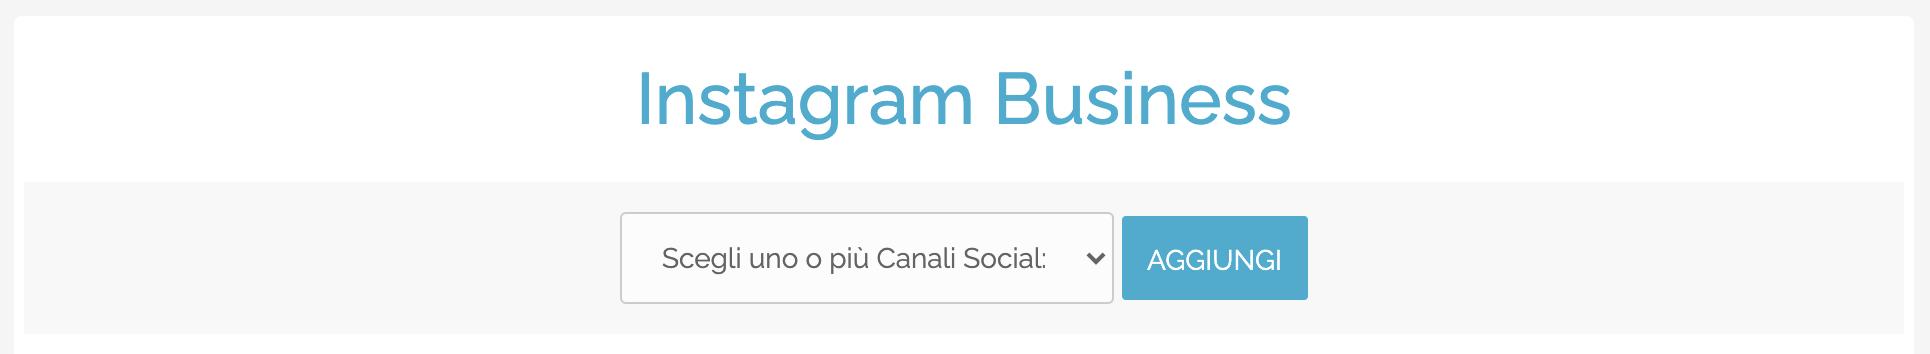 Finestra di scelta account Instagram Business